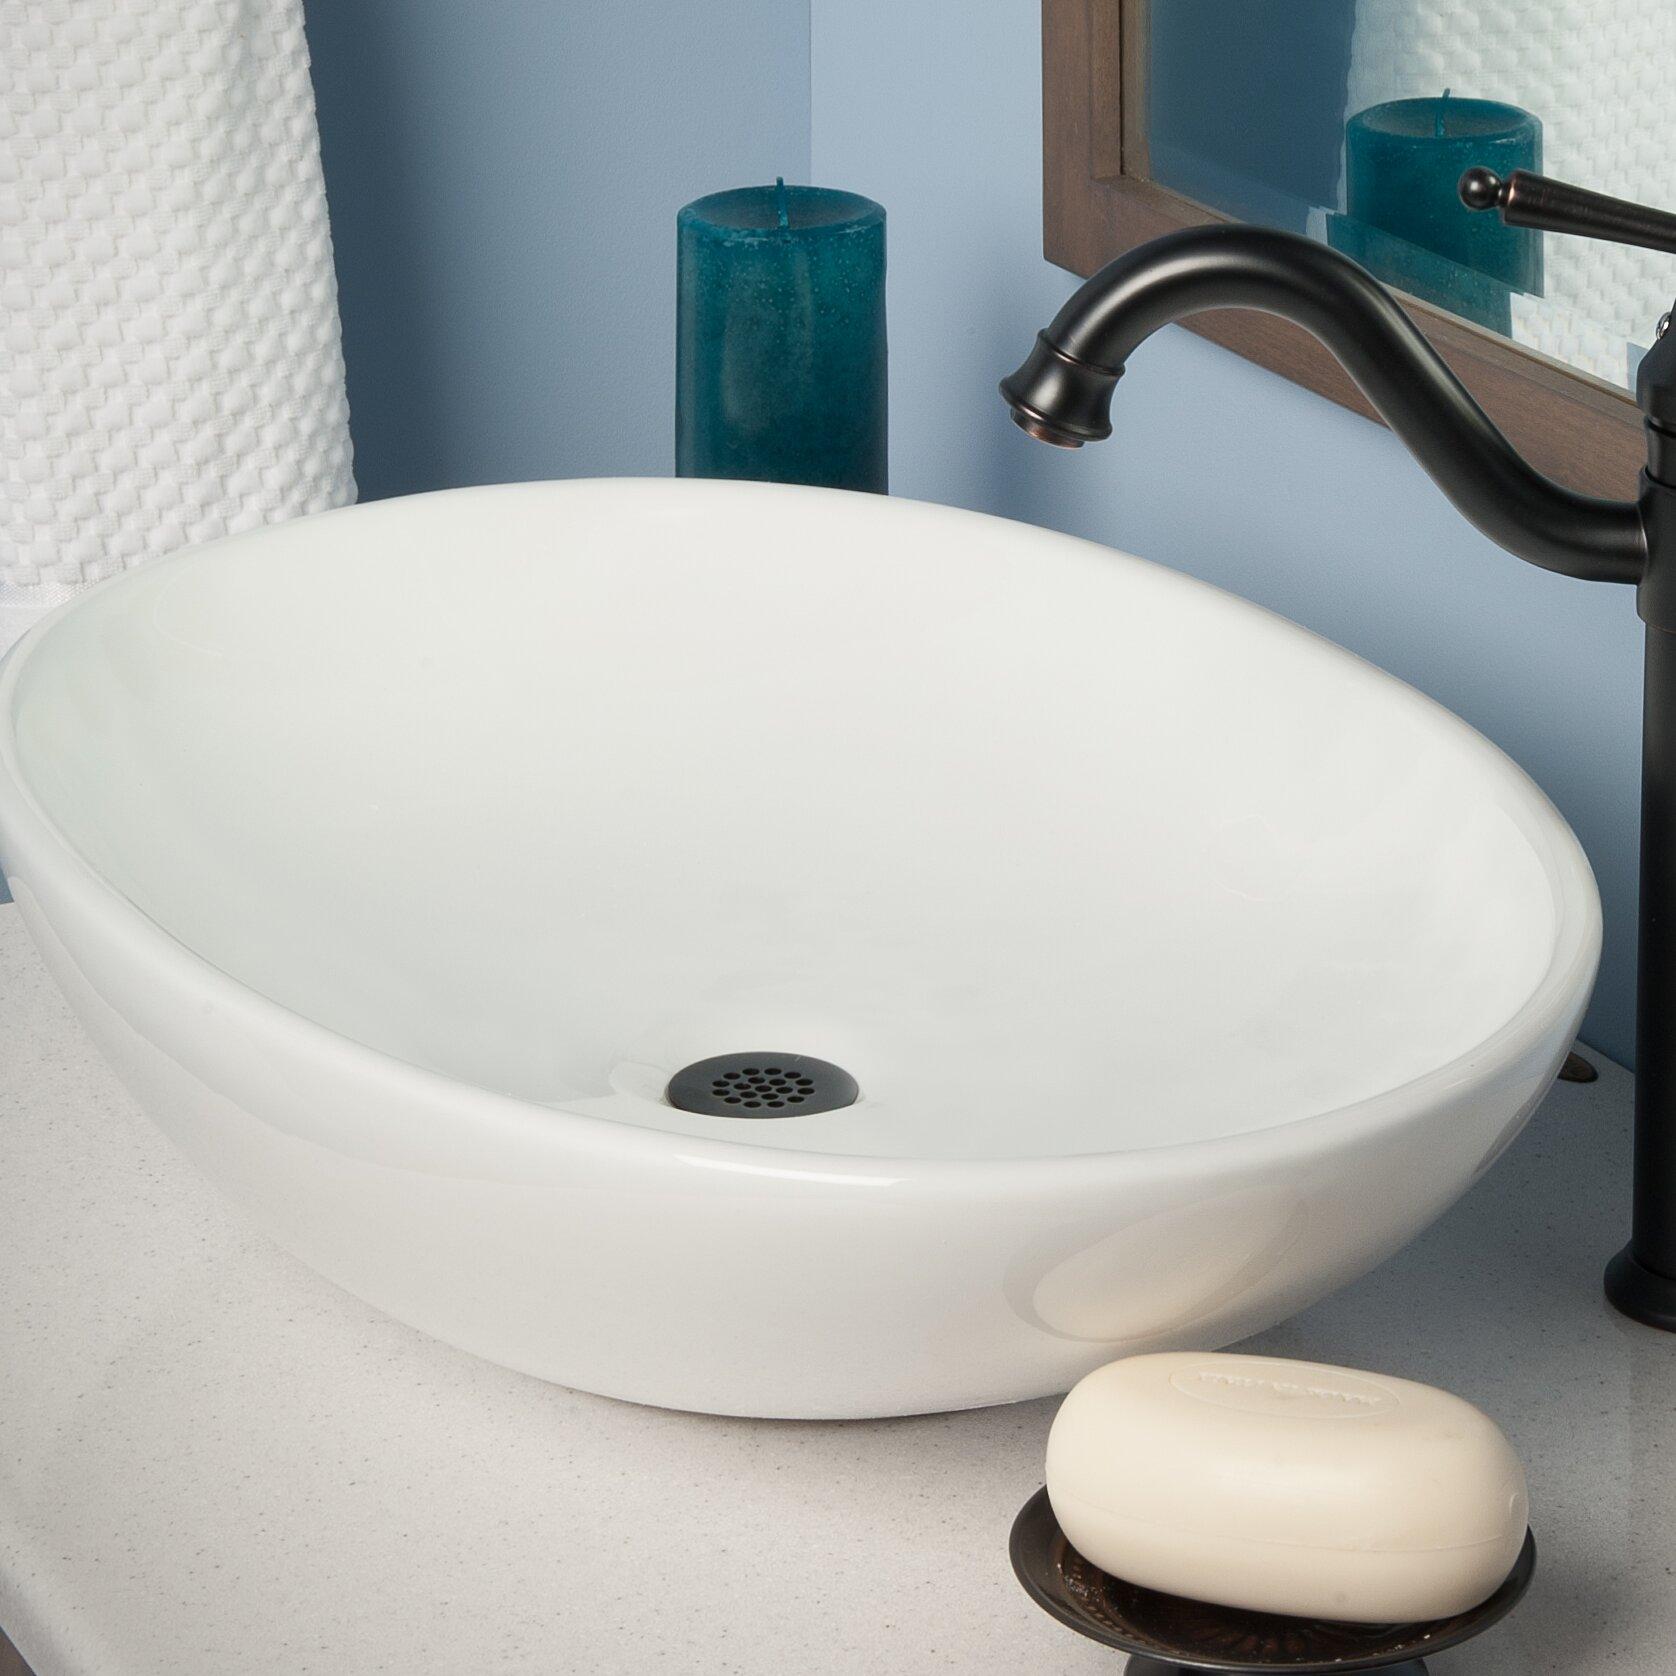 Novatto Oval Ceramic Vessel Bathroom Sink with Overflow Wayfair.ca